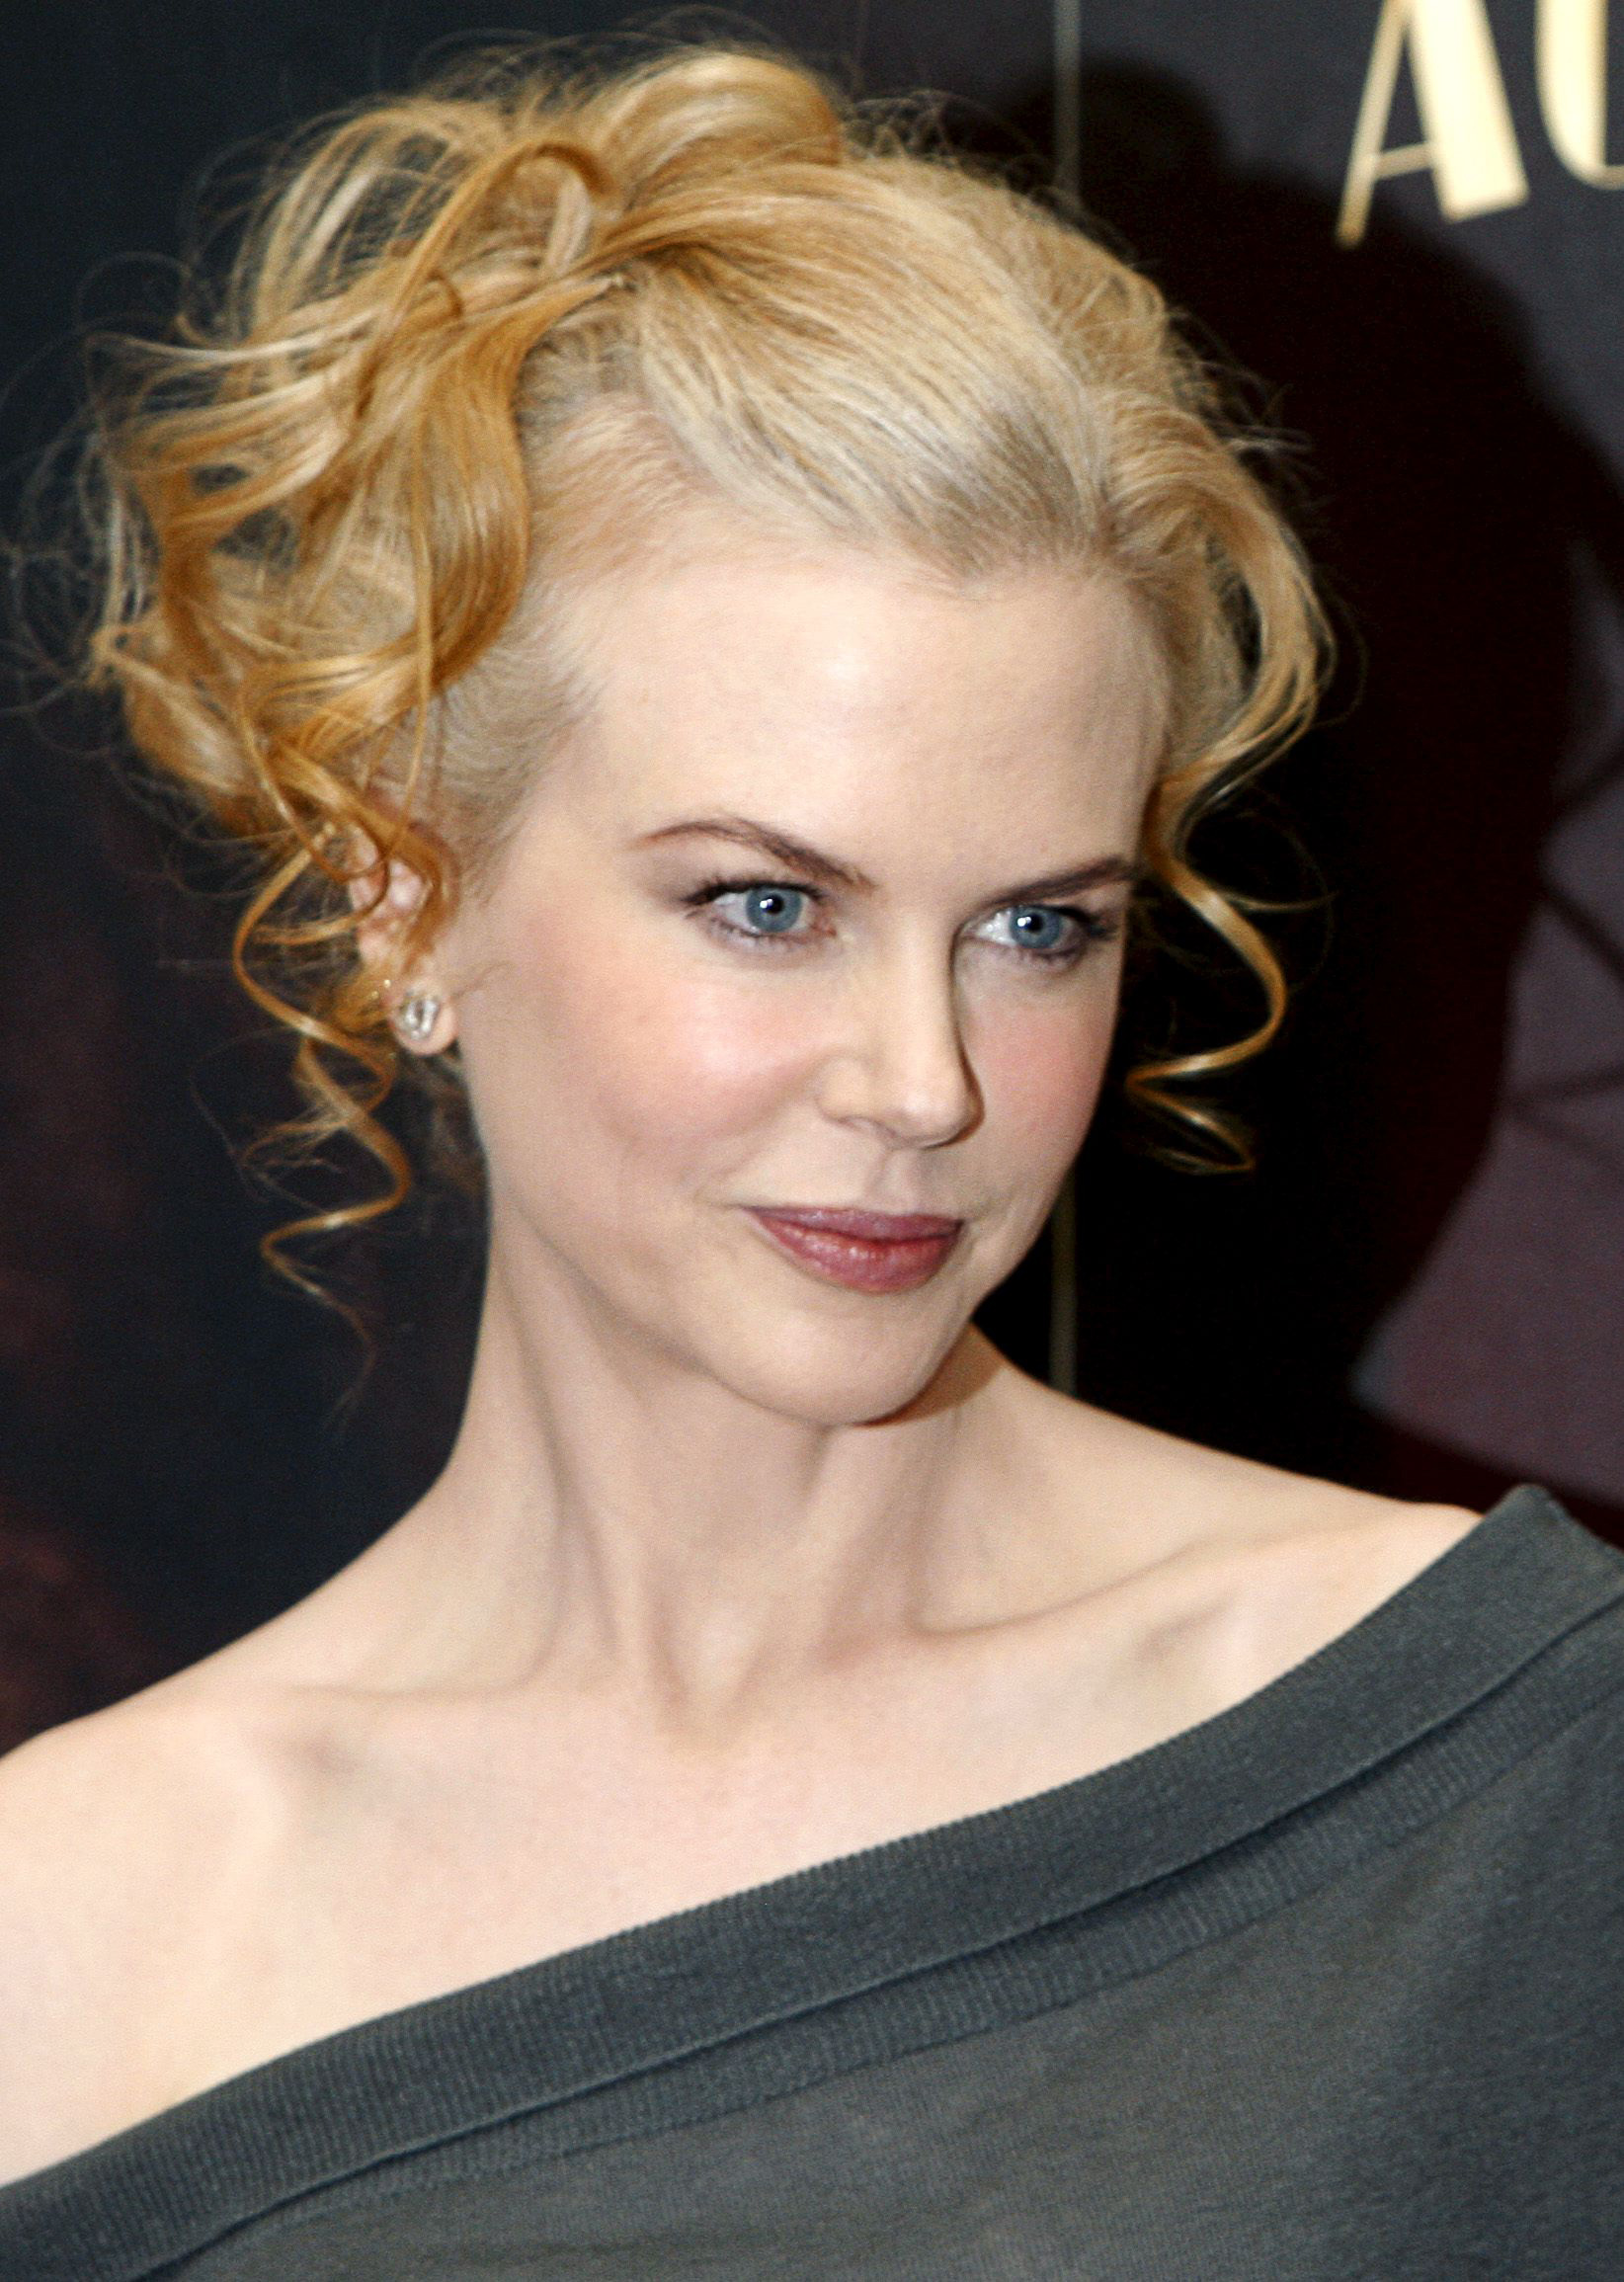 Nicole Kidman #263913 ...